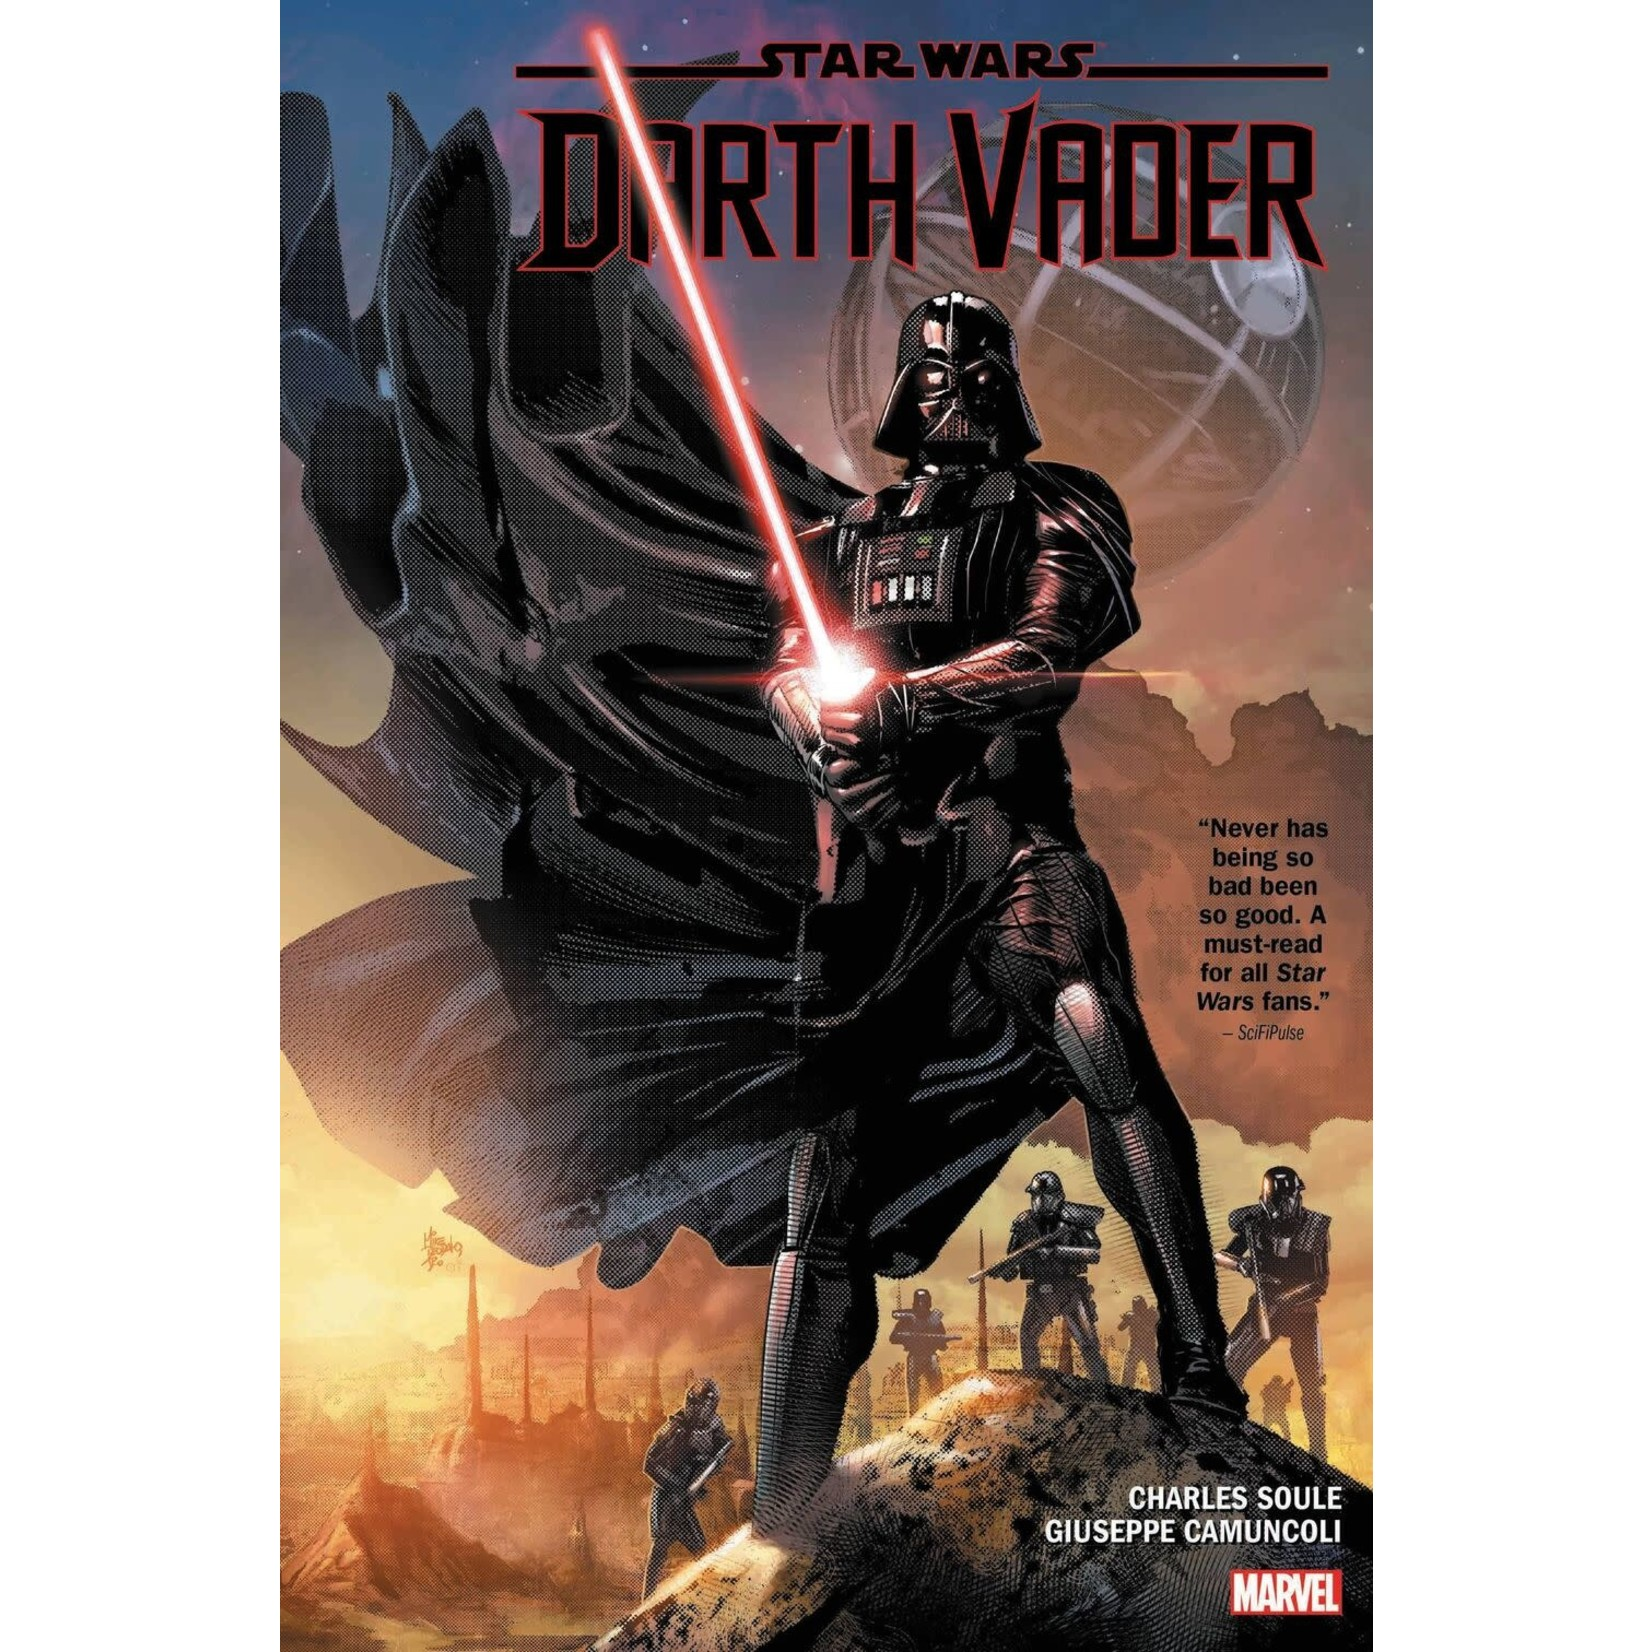 [Precommande] STAR WARS: DARTH VADER BY CHARLES SOULE OMNIBUS